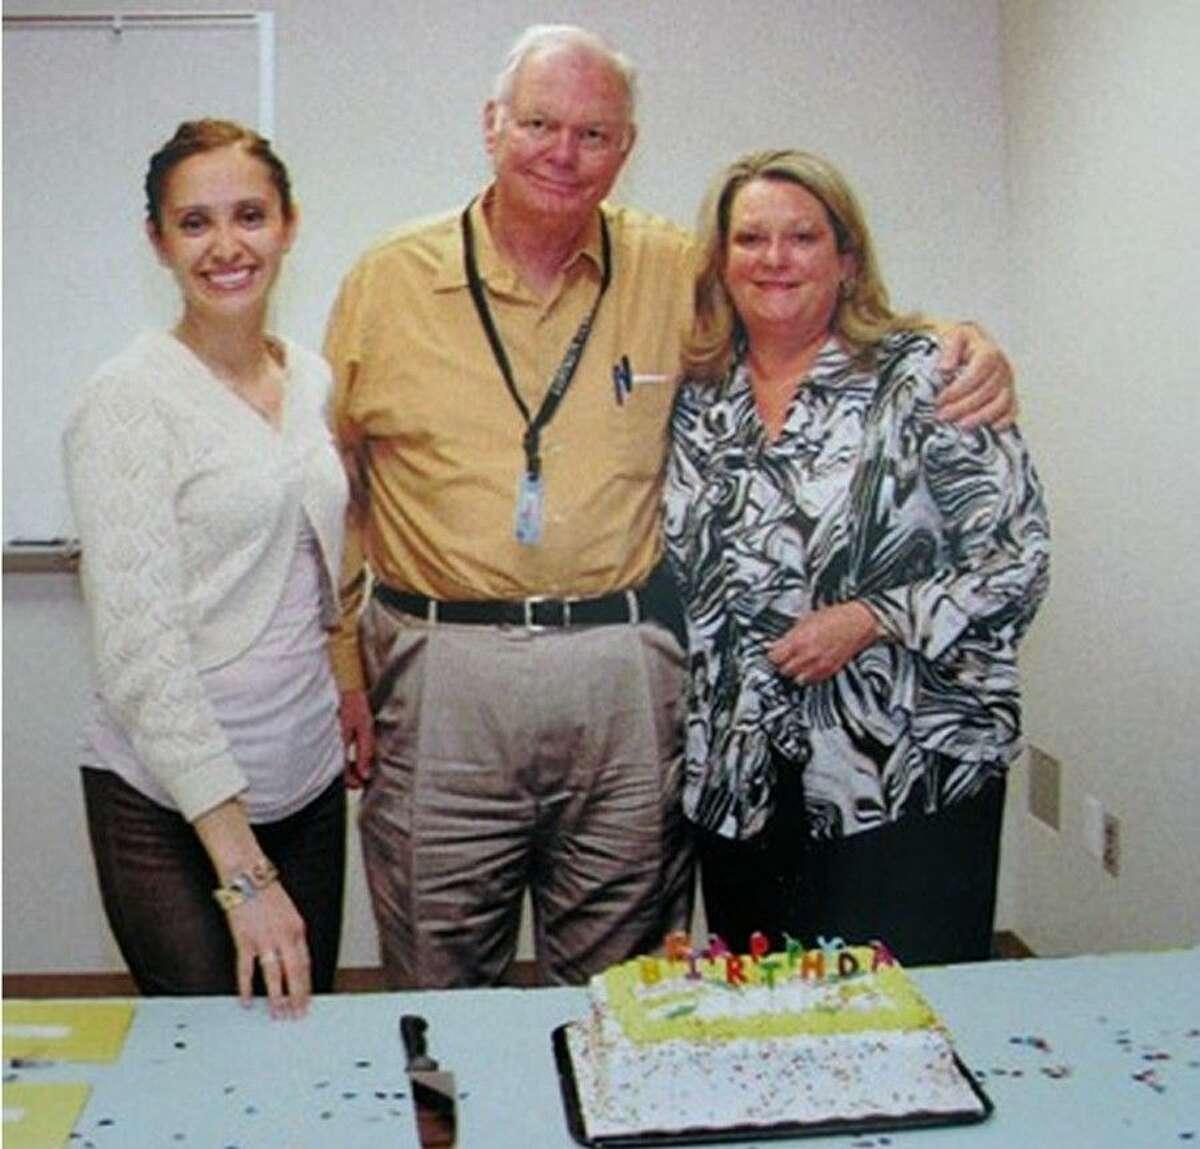 Fred King with District Clerk's Disbursement Officer Araceli Carizales and Civil Bureau Director Debbie Bucko.